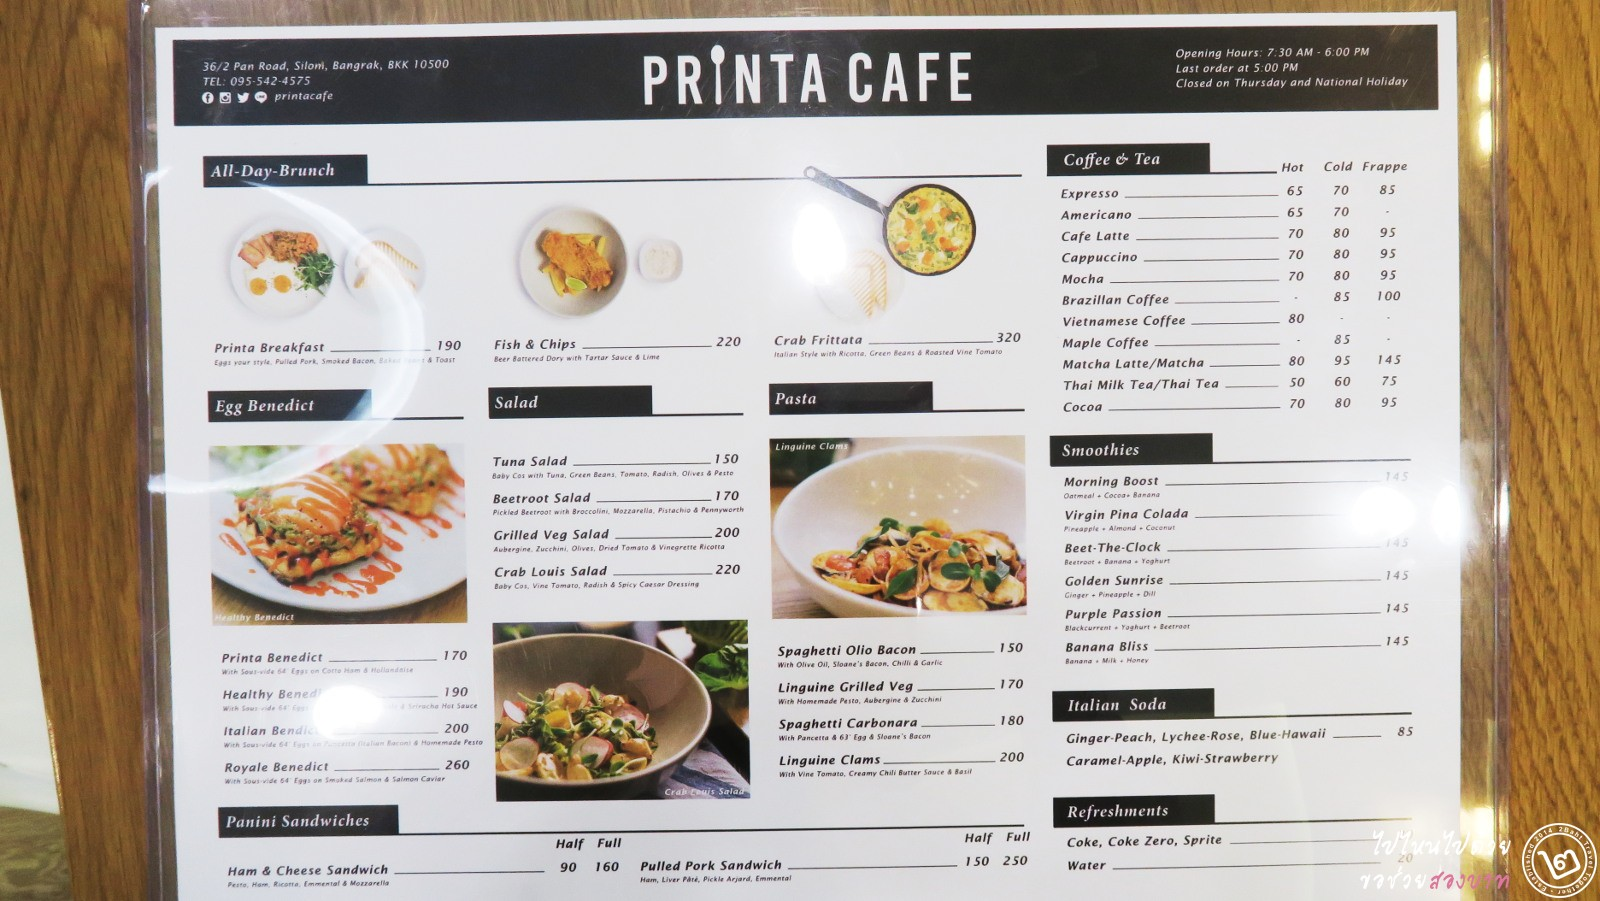 Printa Cafe Menu